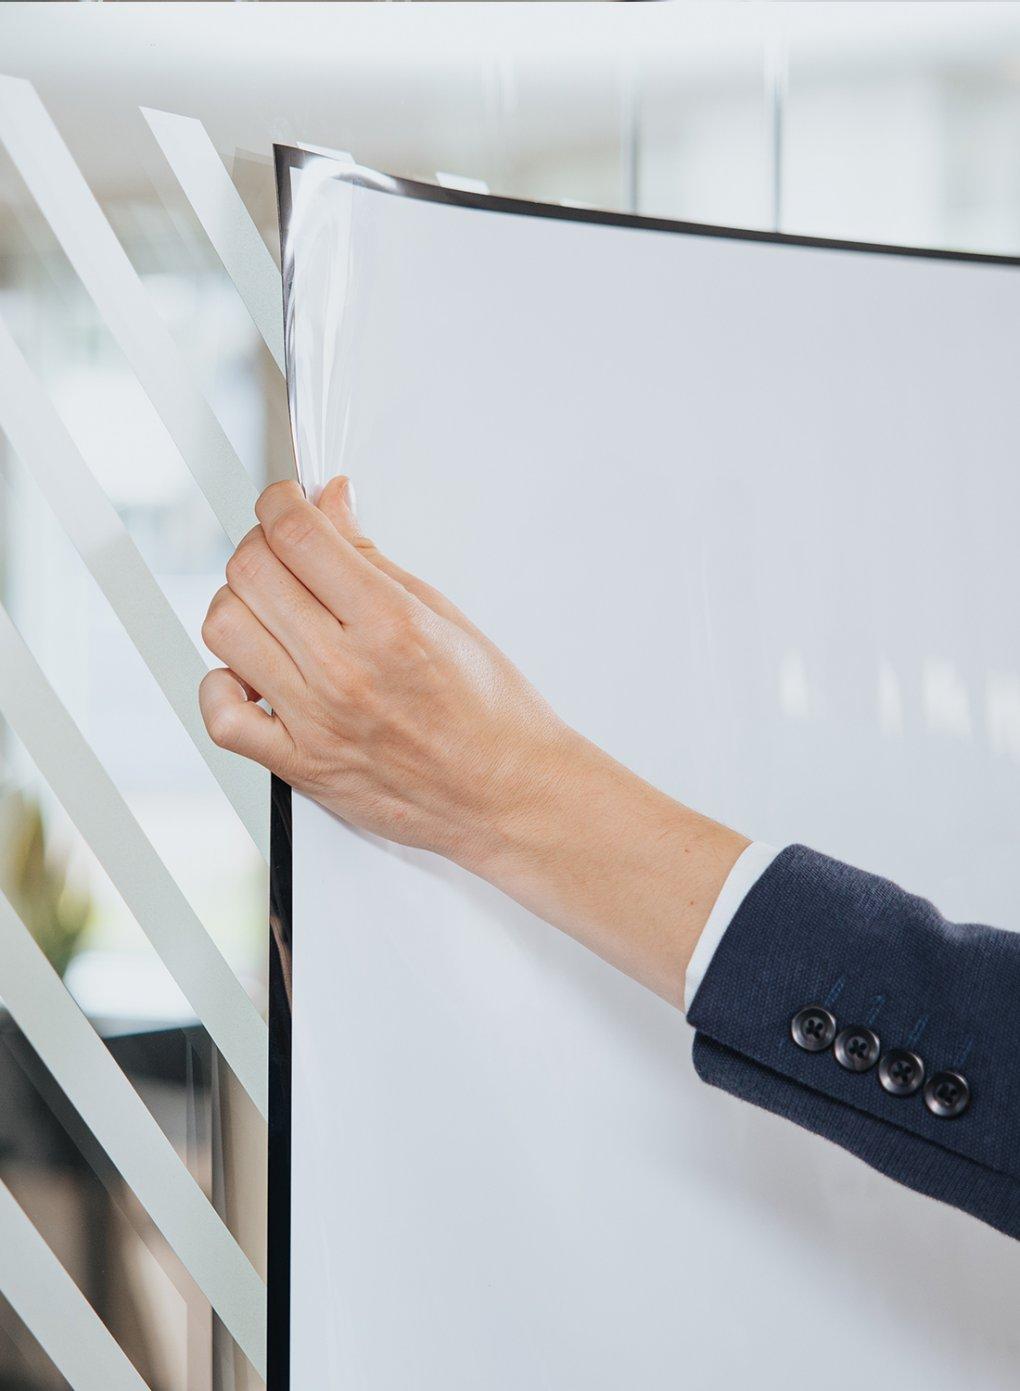 Sticking a Stick-on sheet to a glass wall